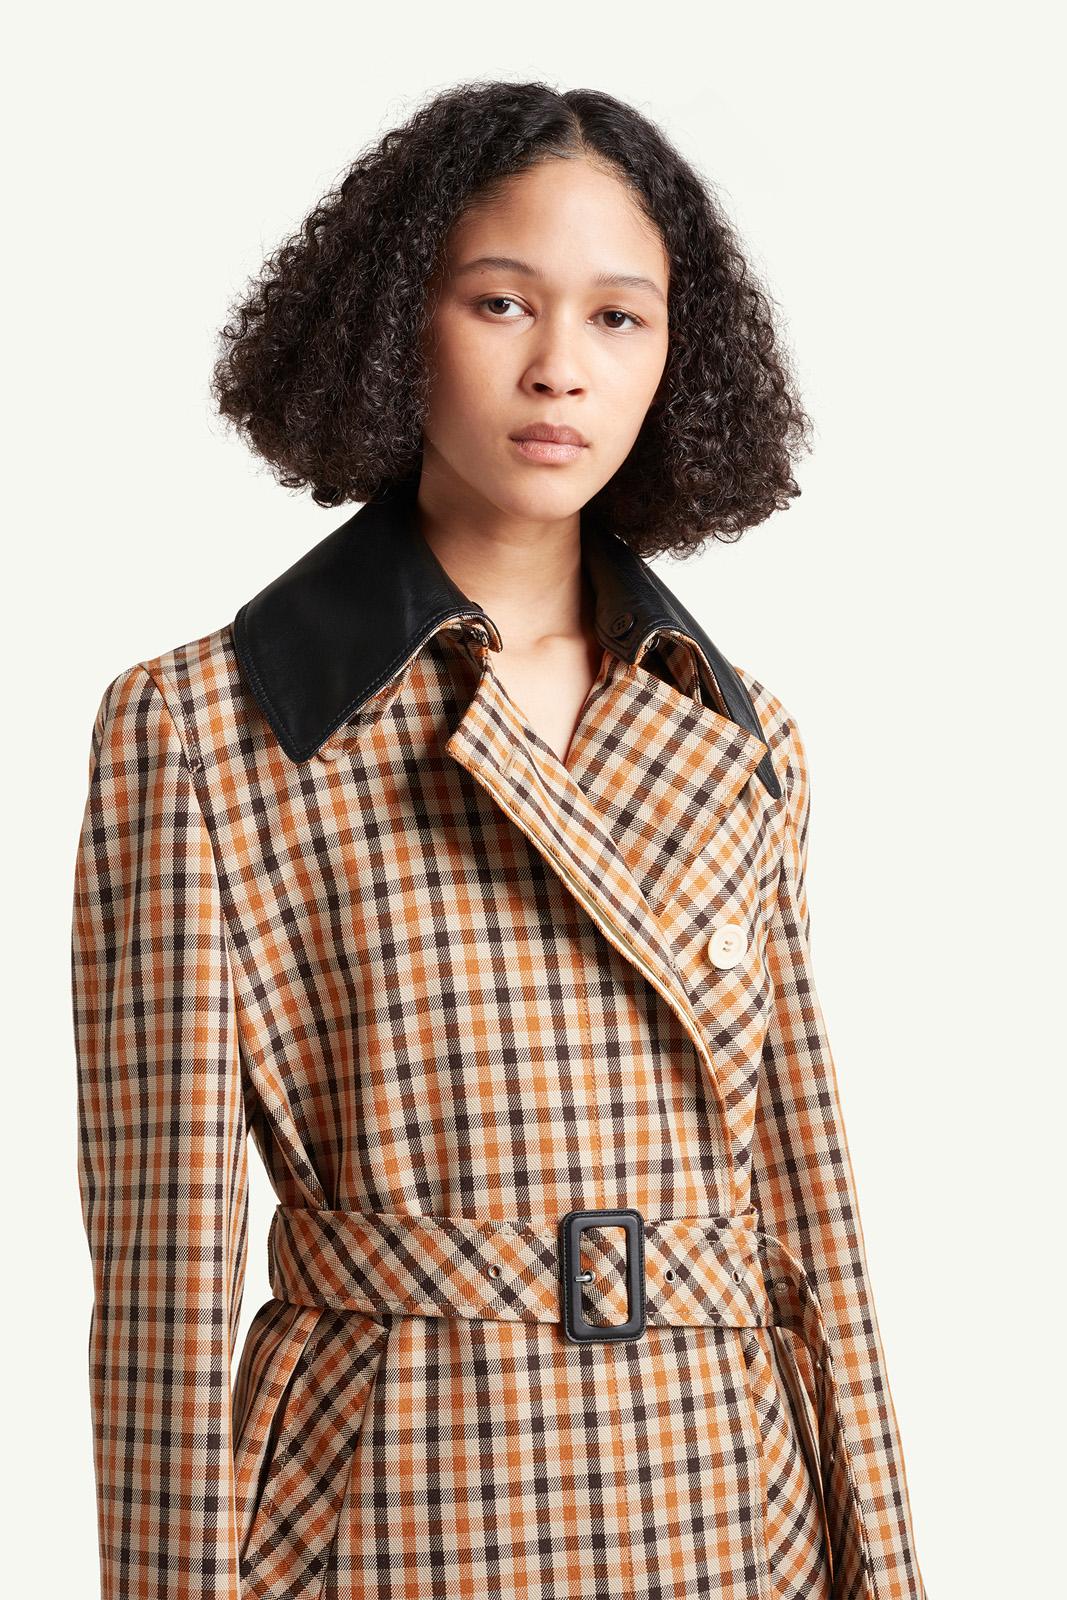 Portrait of Womenswear model wearing light brown checkered Wales Bonner coat | e-Commerce Photography London | LRP